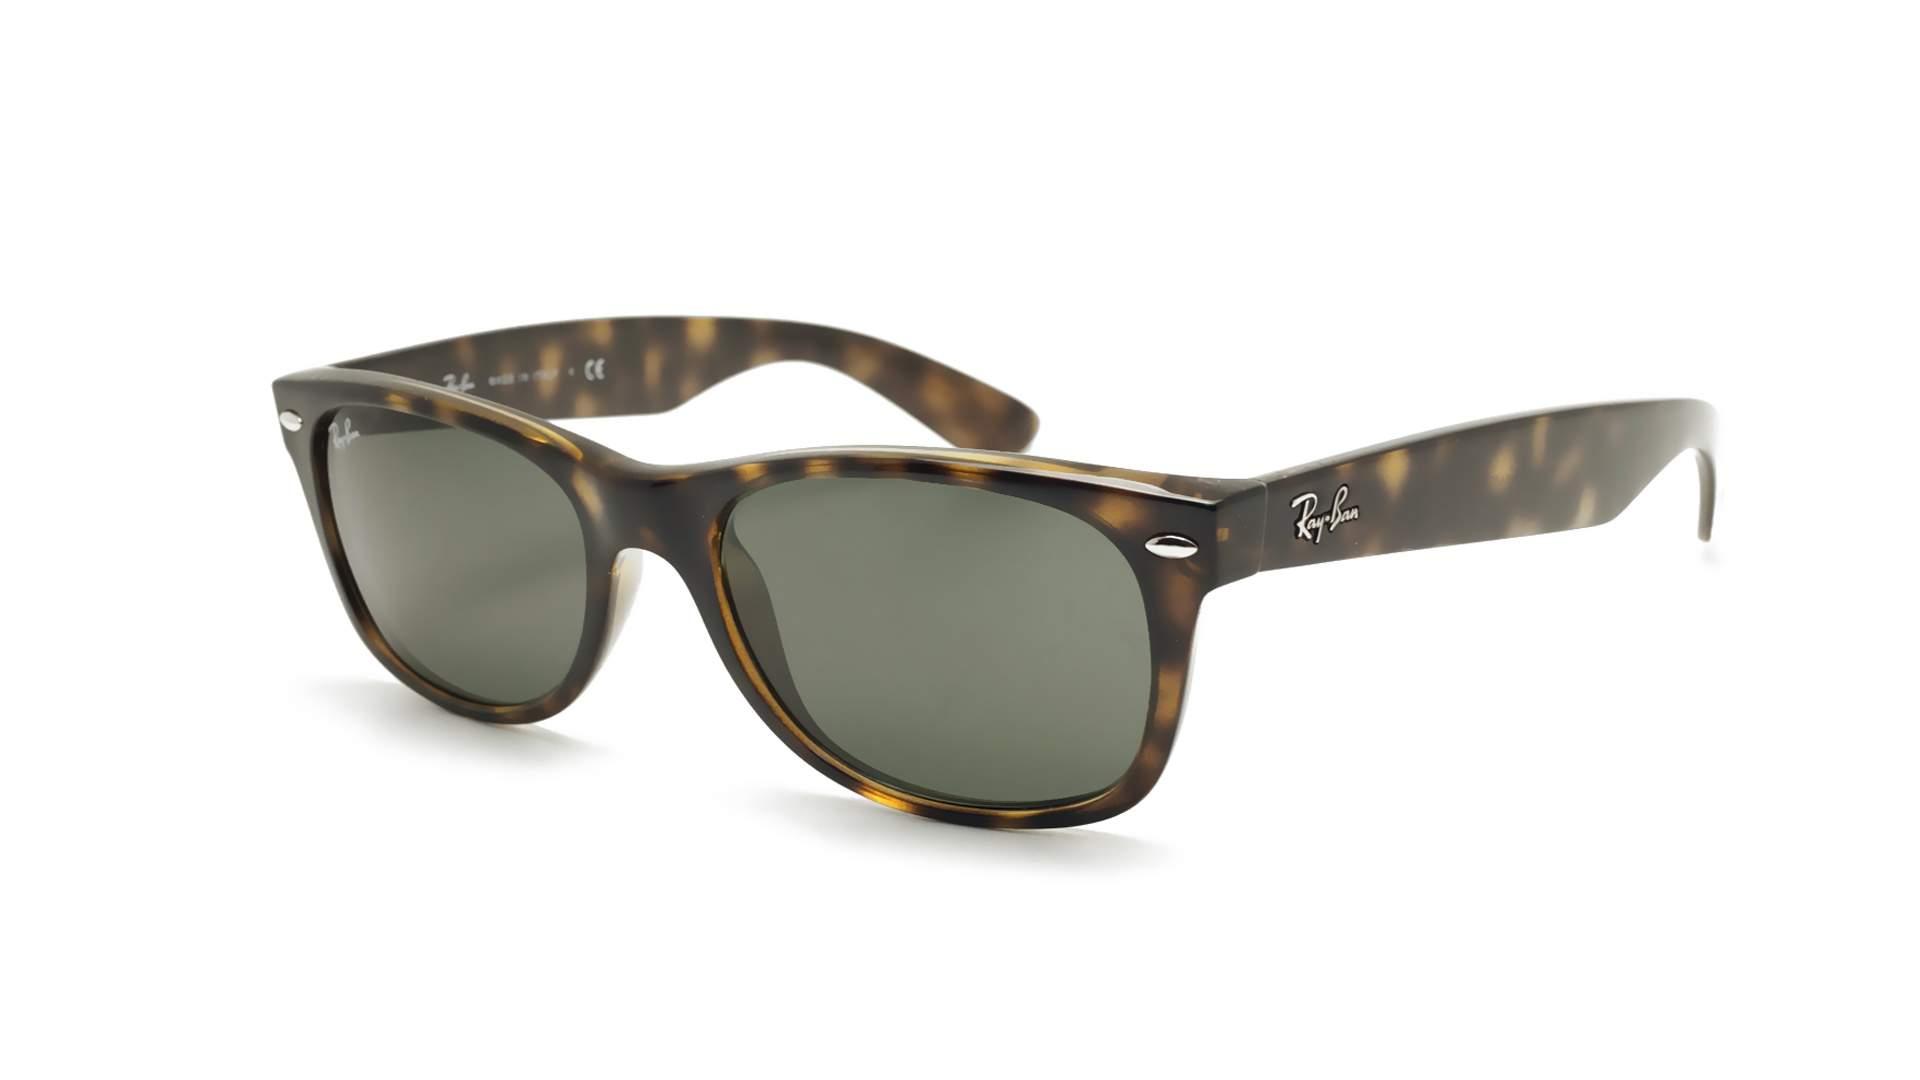 d76f213d70f Sunglasses Ray-Ban New Wayfarer Tortoise RB2132 902 52-18 Medium